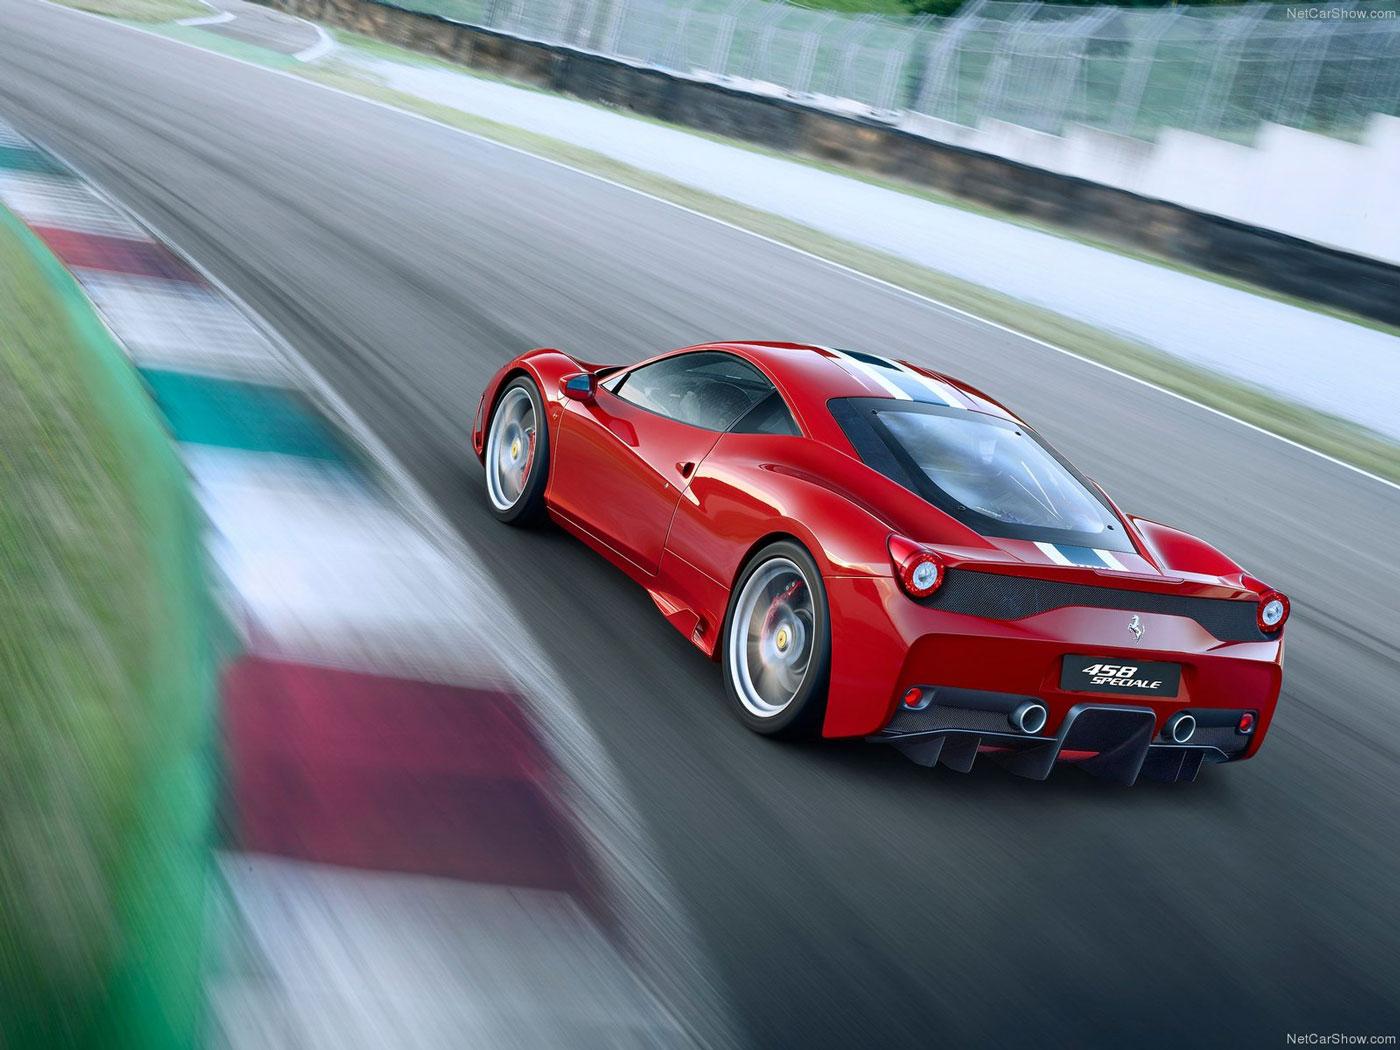 Ferrari-458_Speciale_2014_1600x1200_wallpaper_14